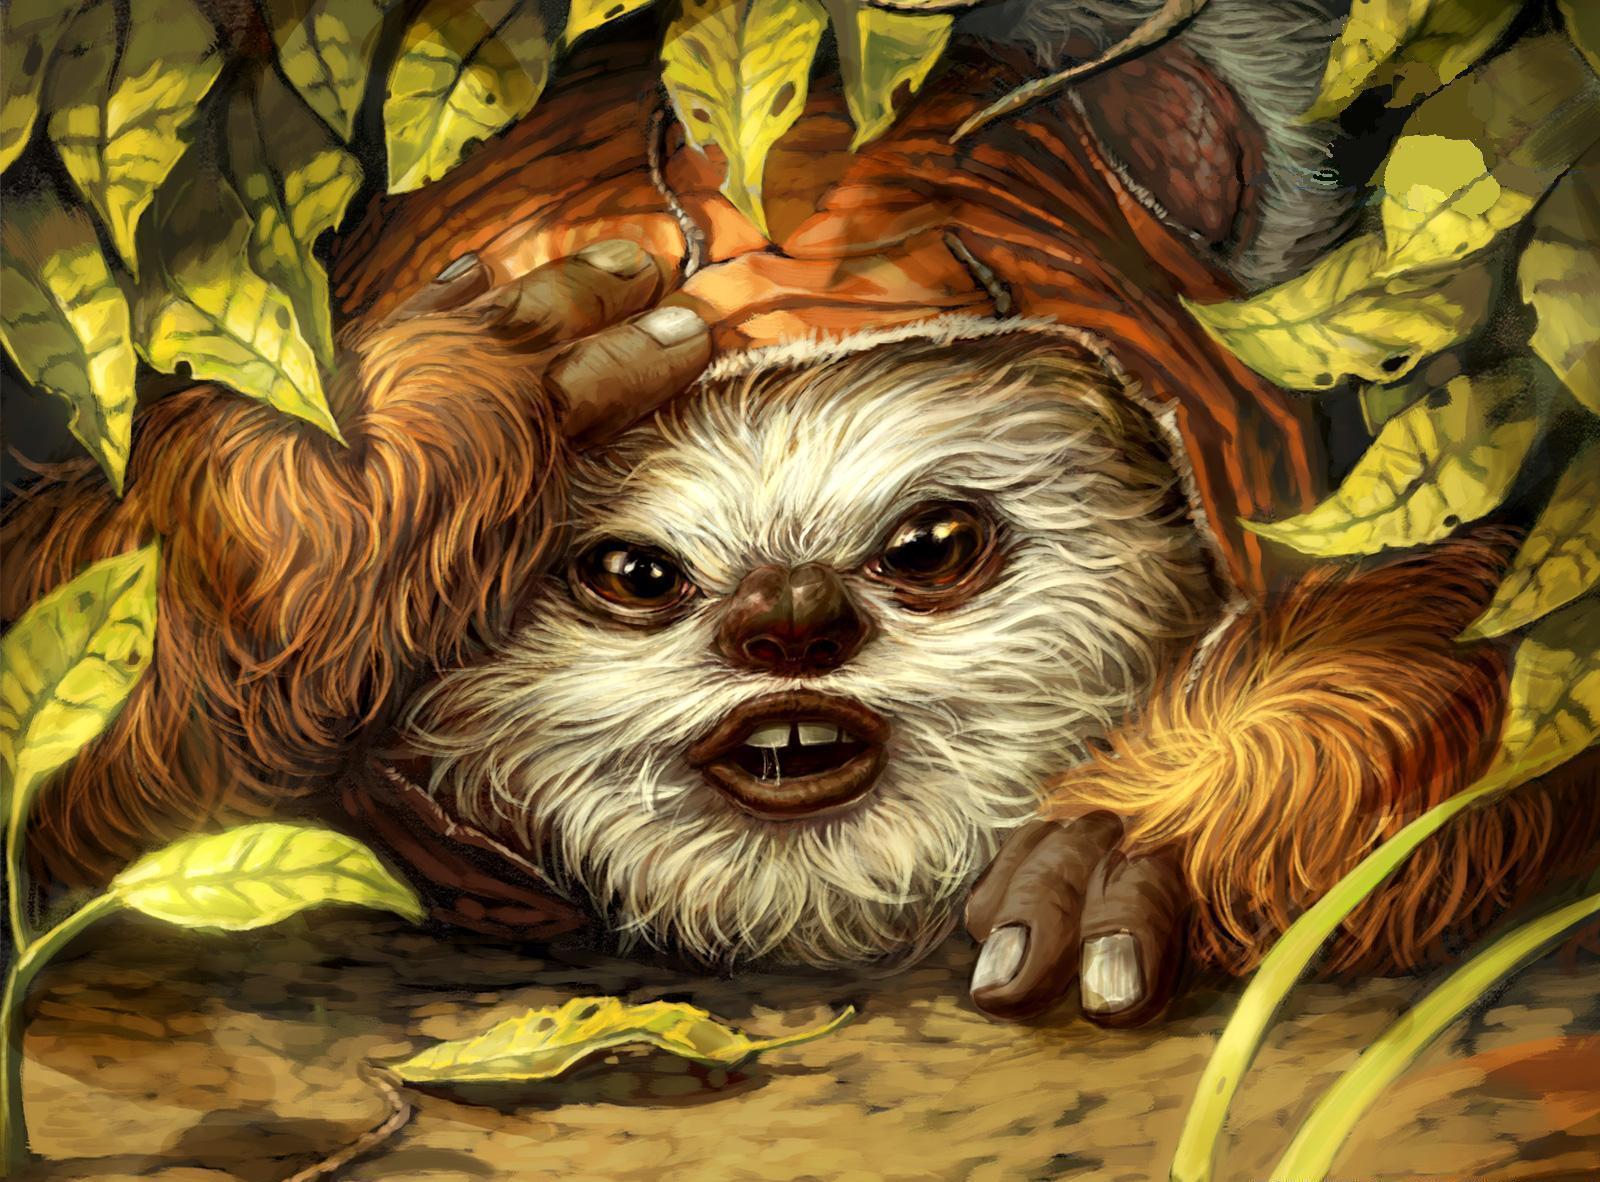 Ewok wookieepedia the star wars wiki - Ewok wallpaper ...